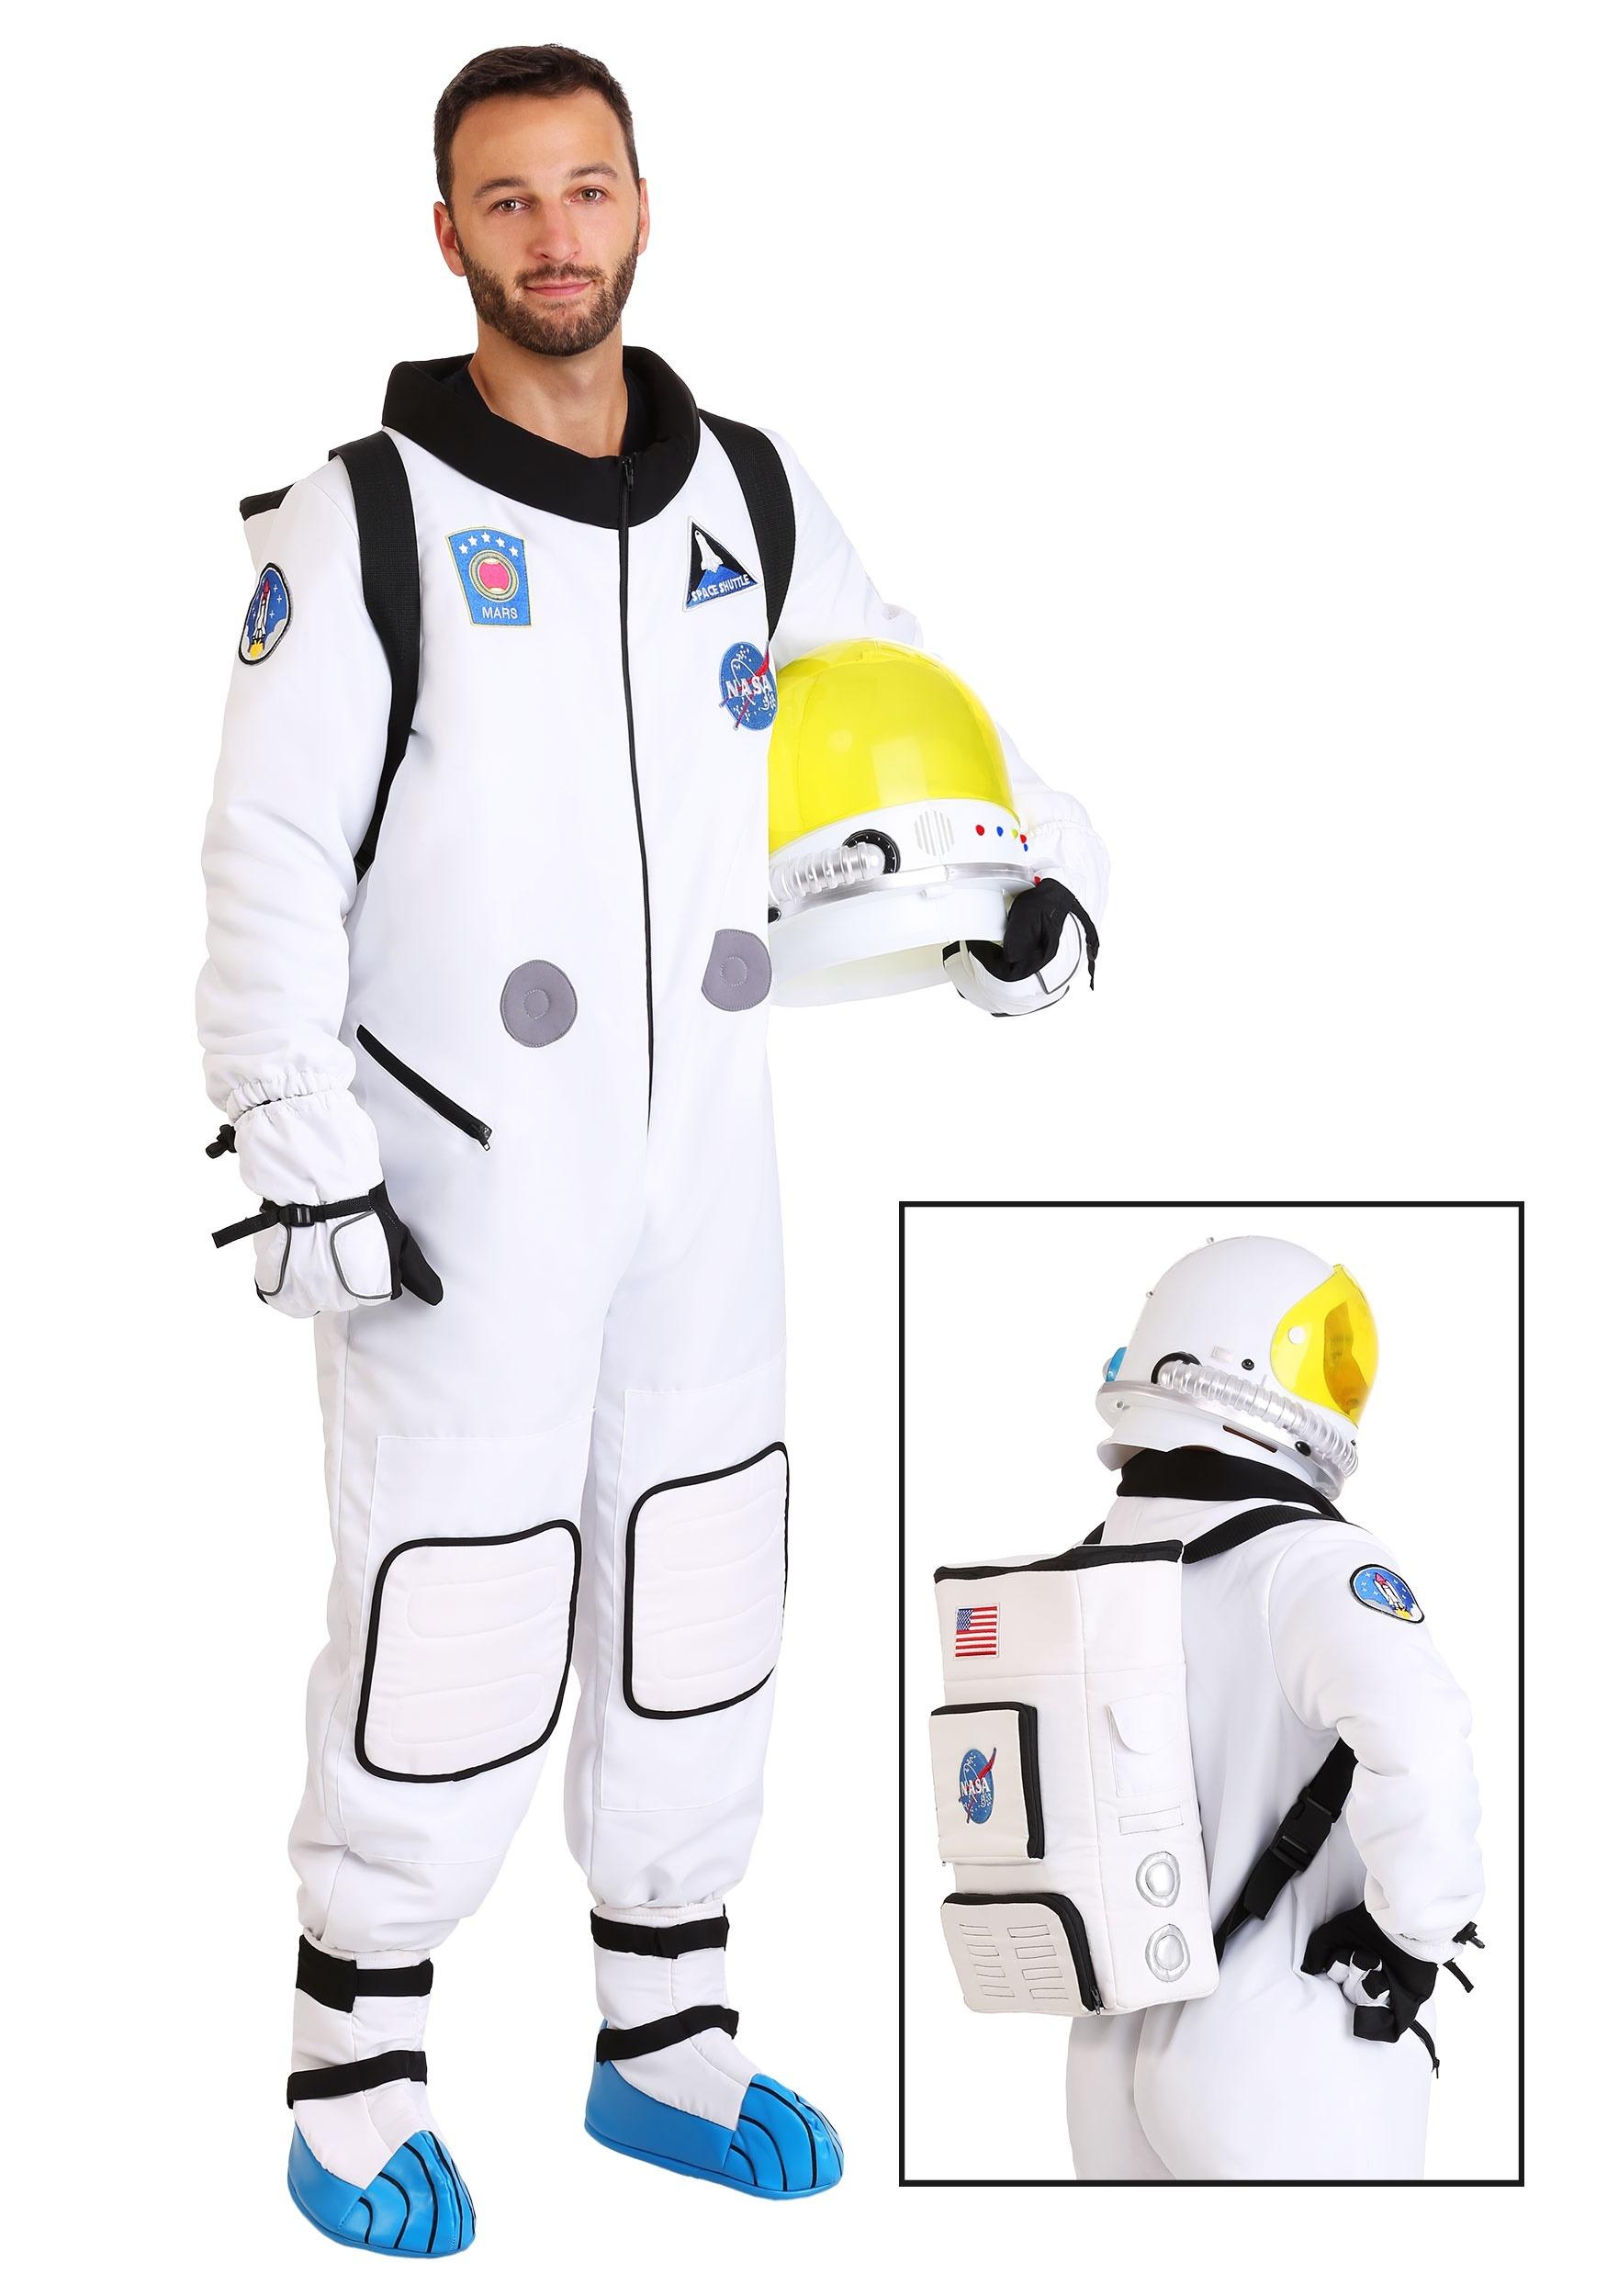 retro astronaut costume - HD1750×2500